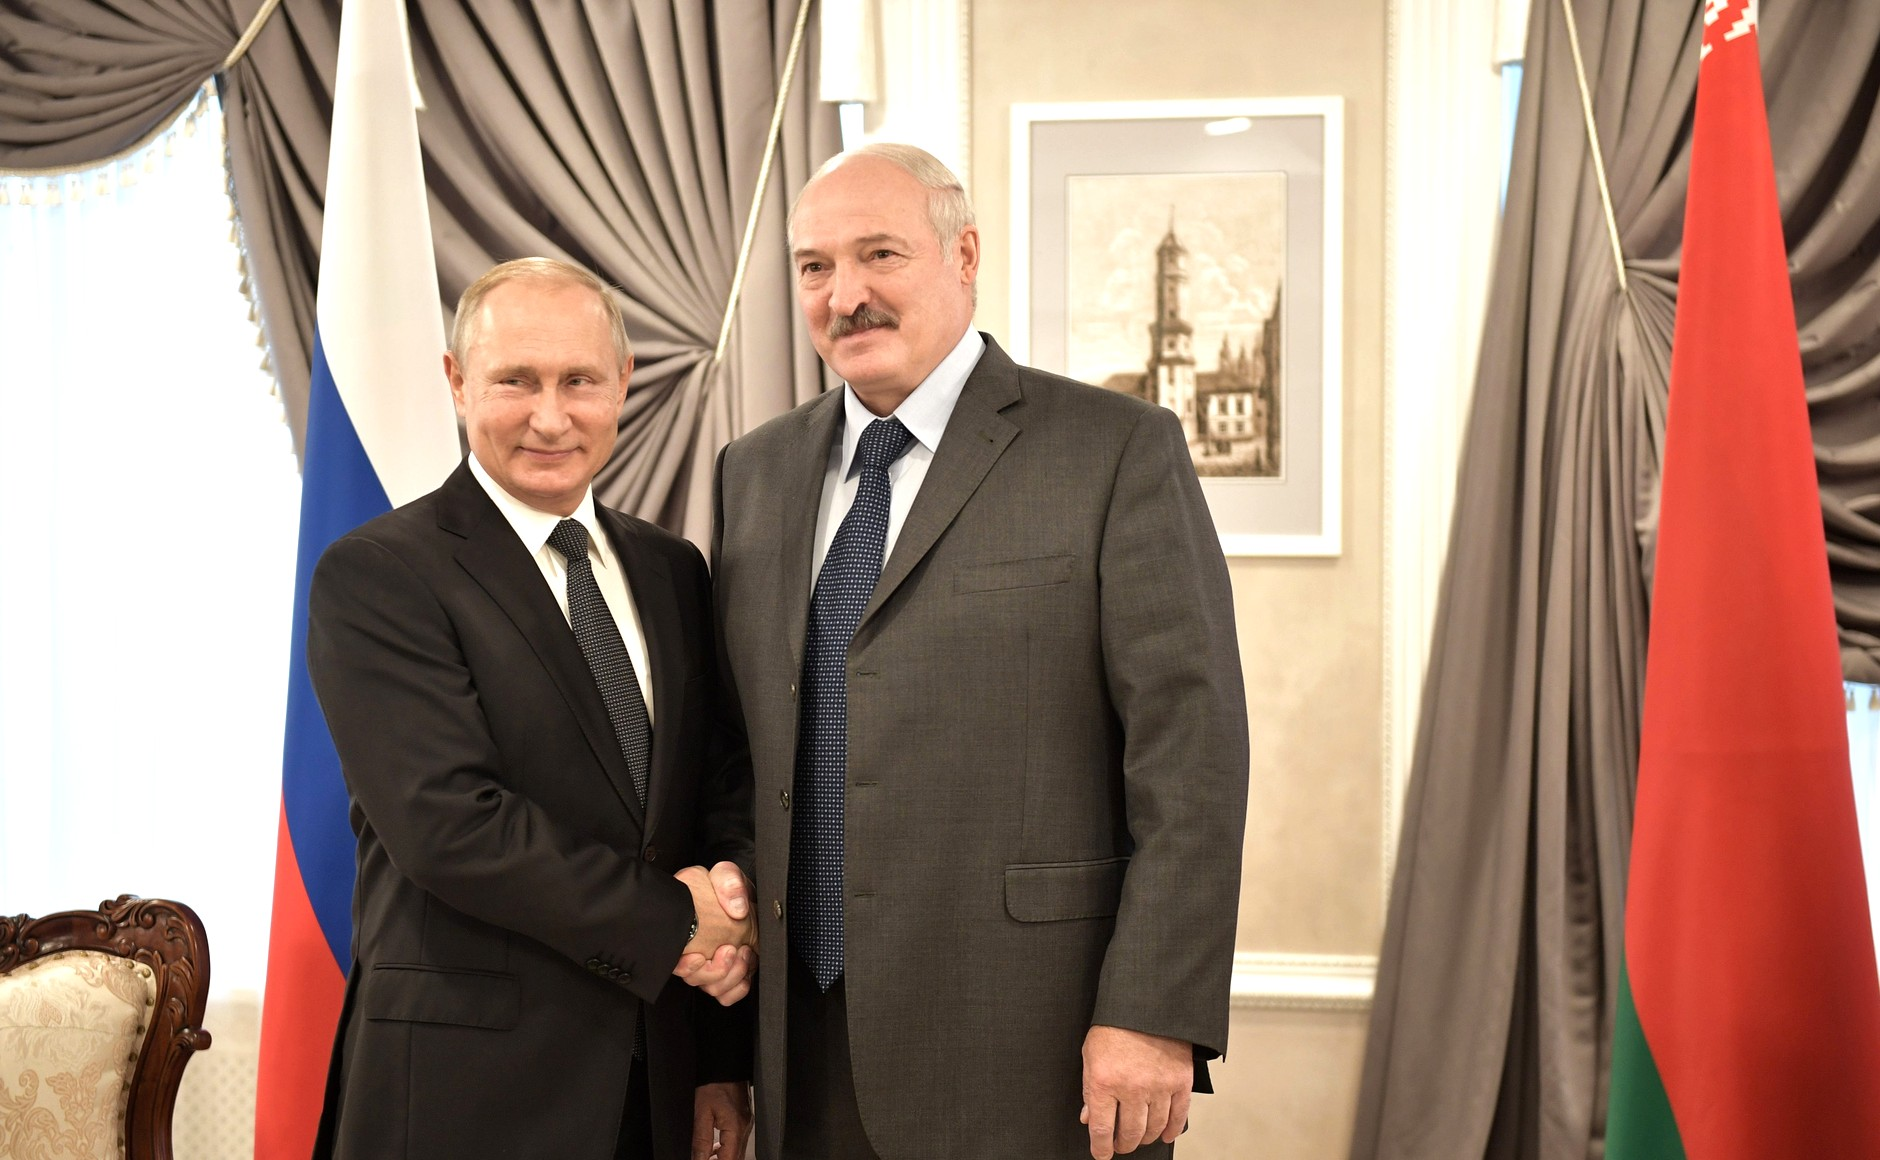 Belarusian President Alexander Lukashenko, right, pictured in October 2018 at a meeting with Russian President Vladimir Putin, left, at the Kremlin. (Kremlin)